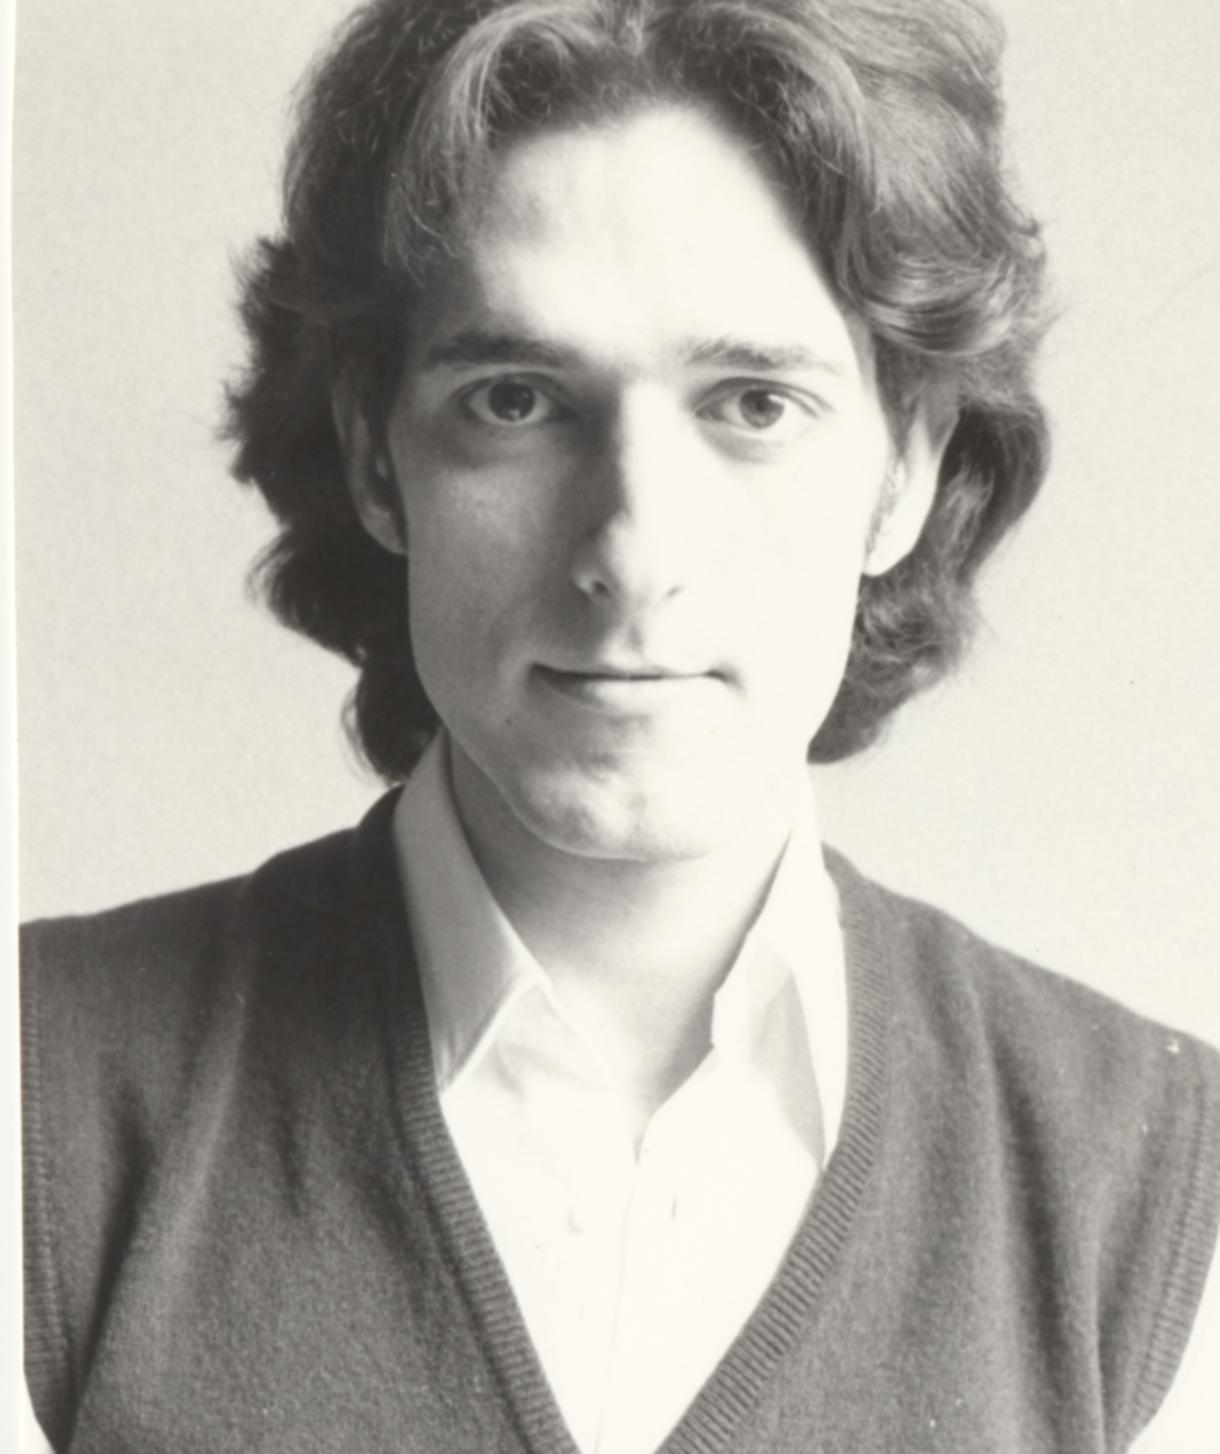 IX. Imago Mundi-Kongress 1982, Innsbruck, Elmar Gruber